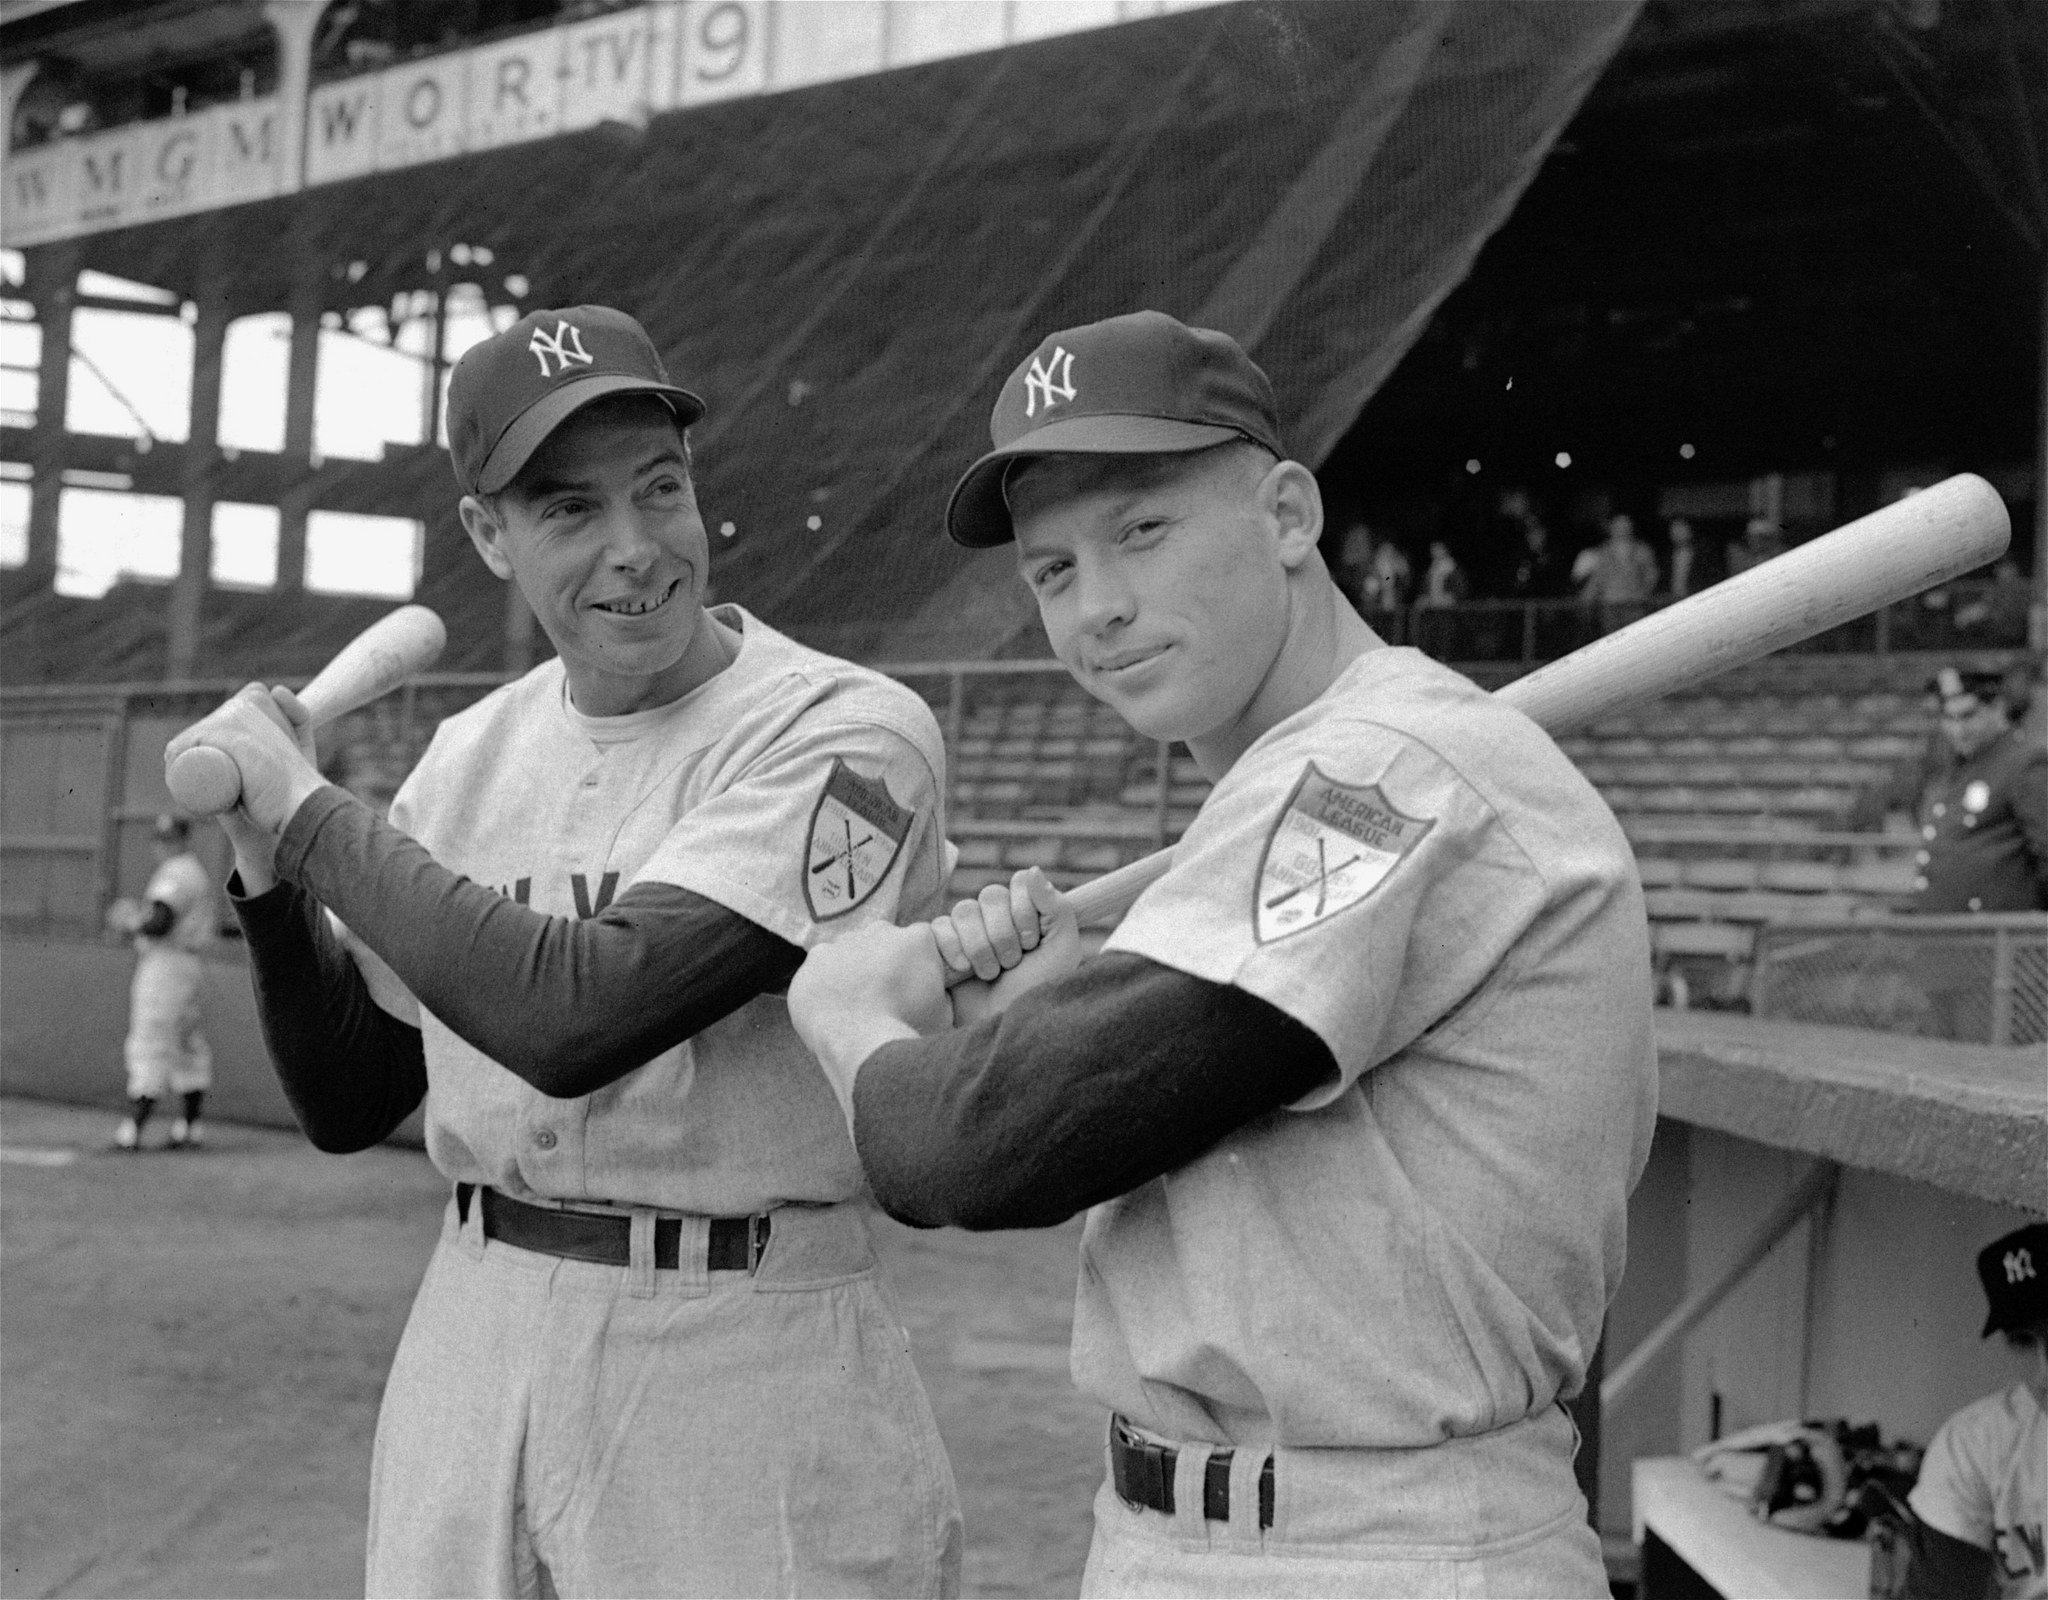 Joe DiMaggio Mickey Mantle Photo Art New York Yankees Baseball Photos Artwork 8x10